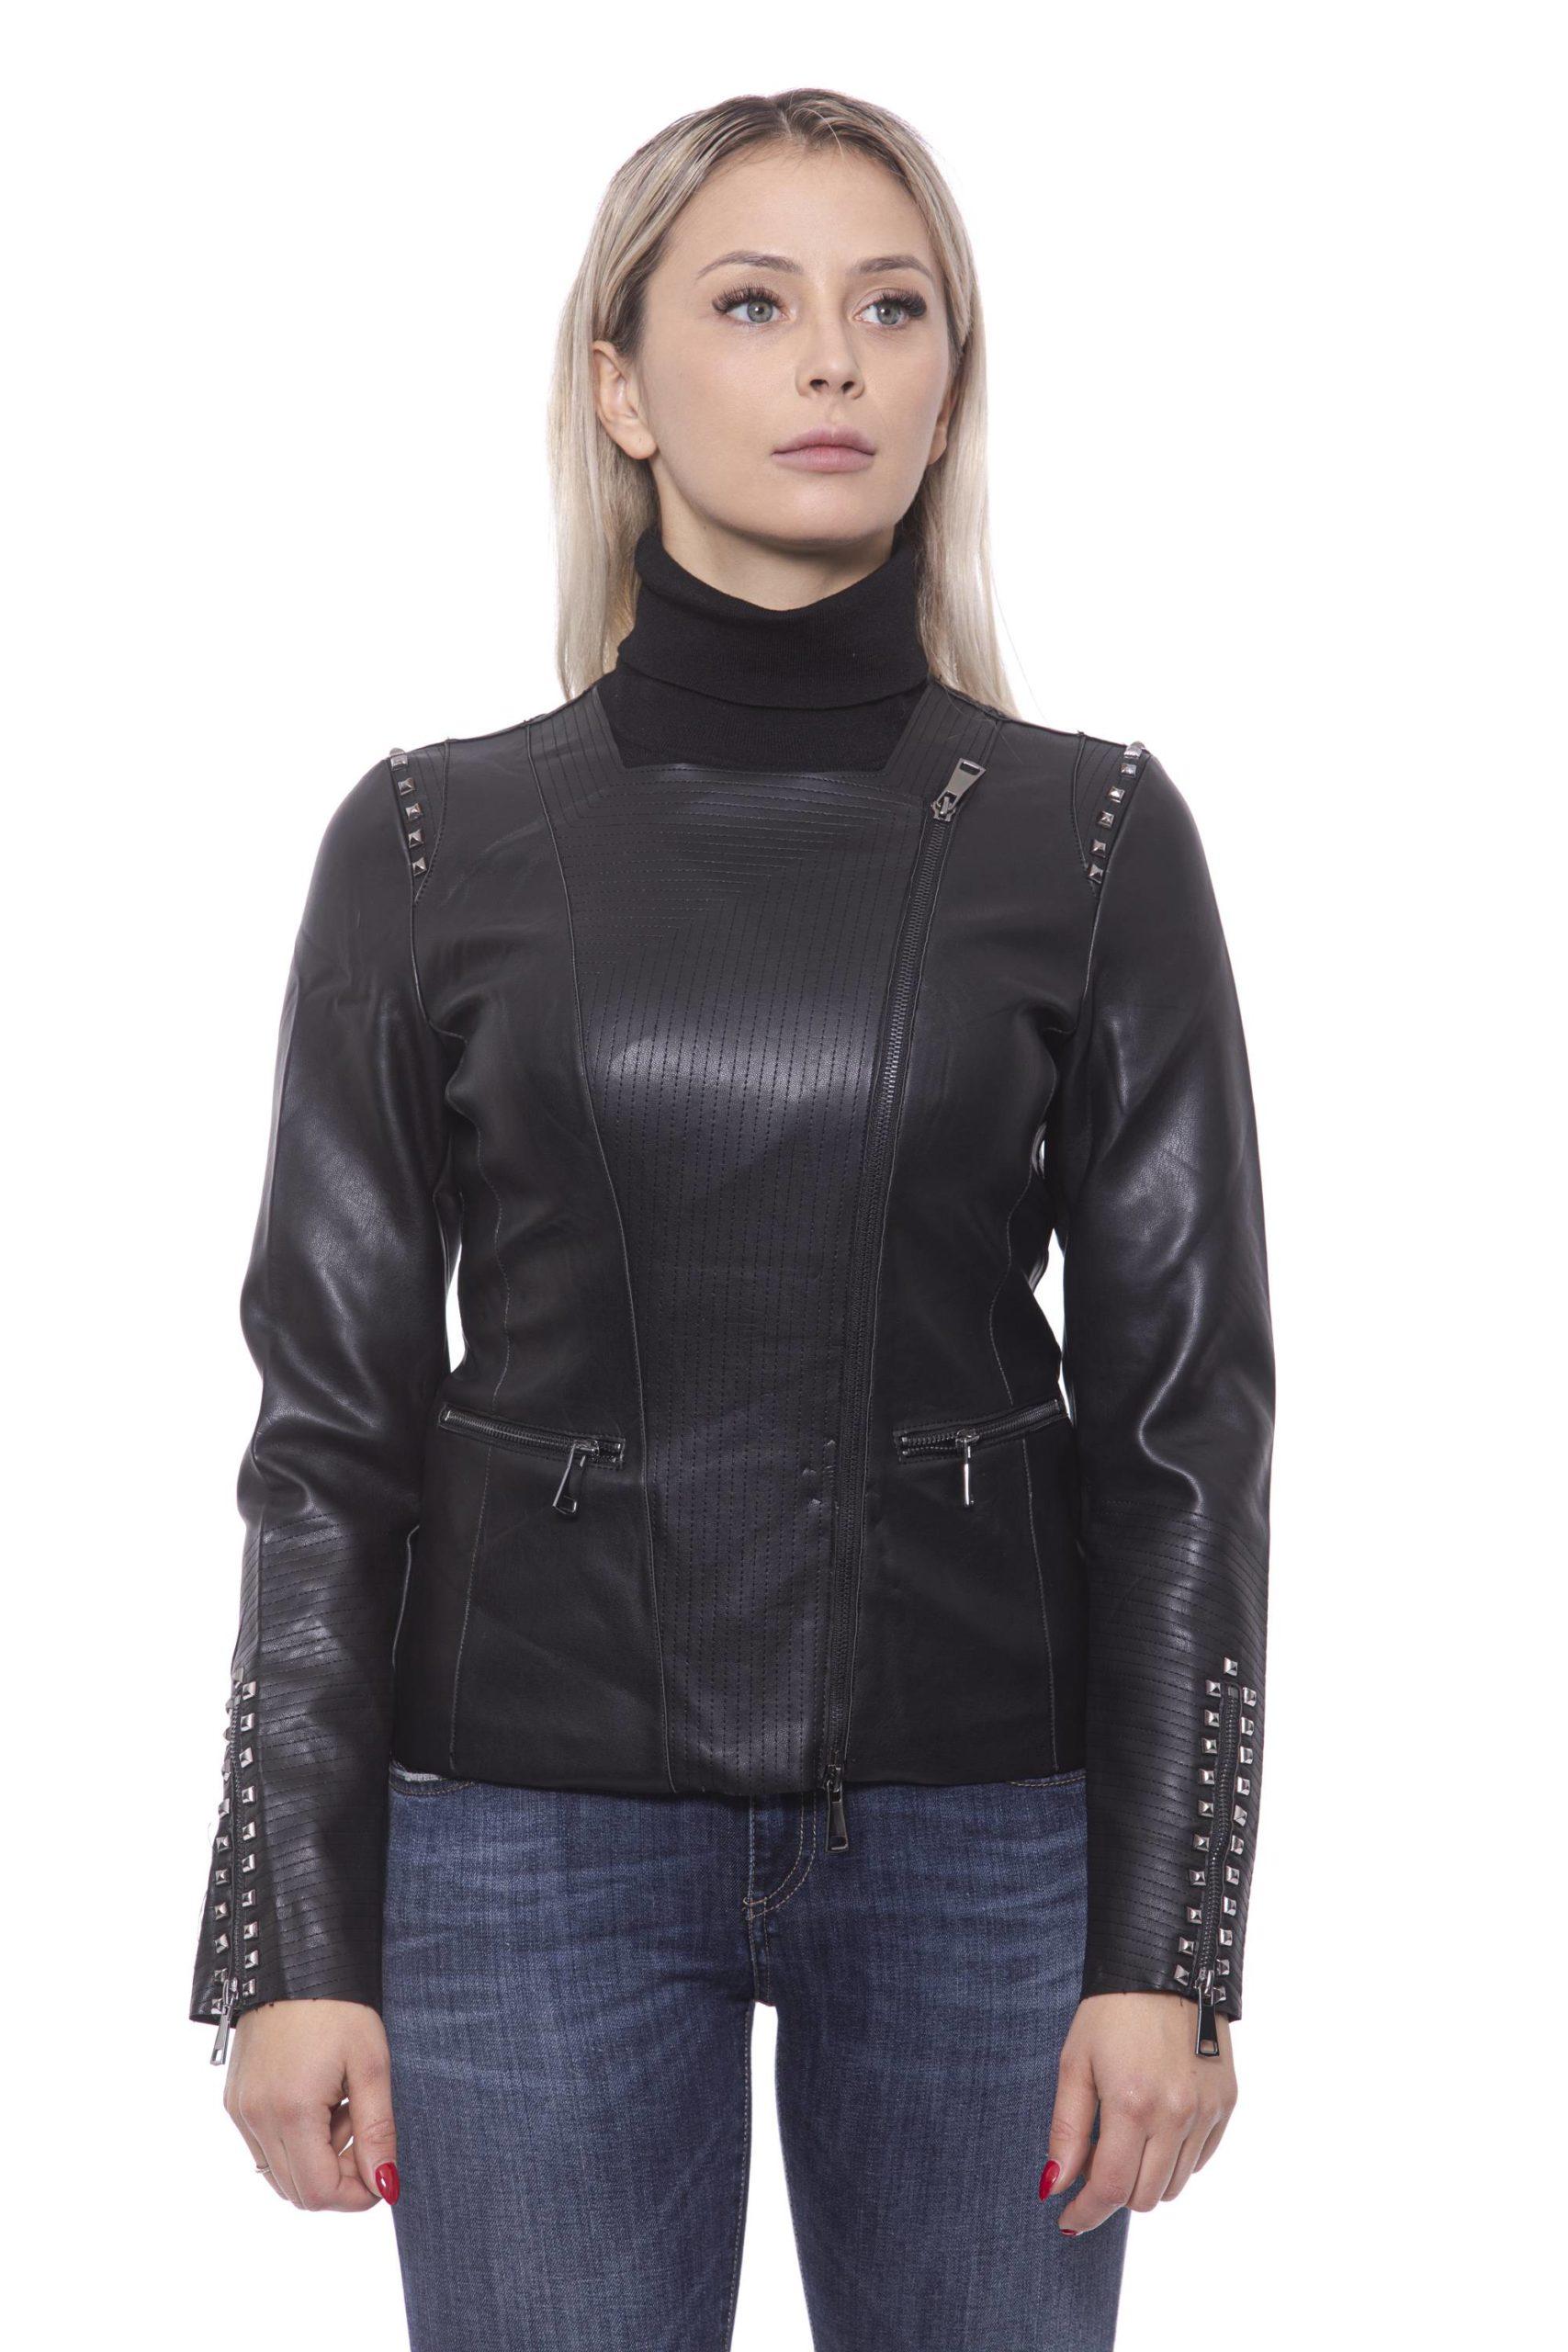 19V69 Italia Women's Nero Jacket 191388462 - M